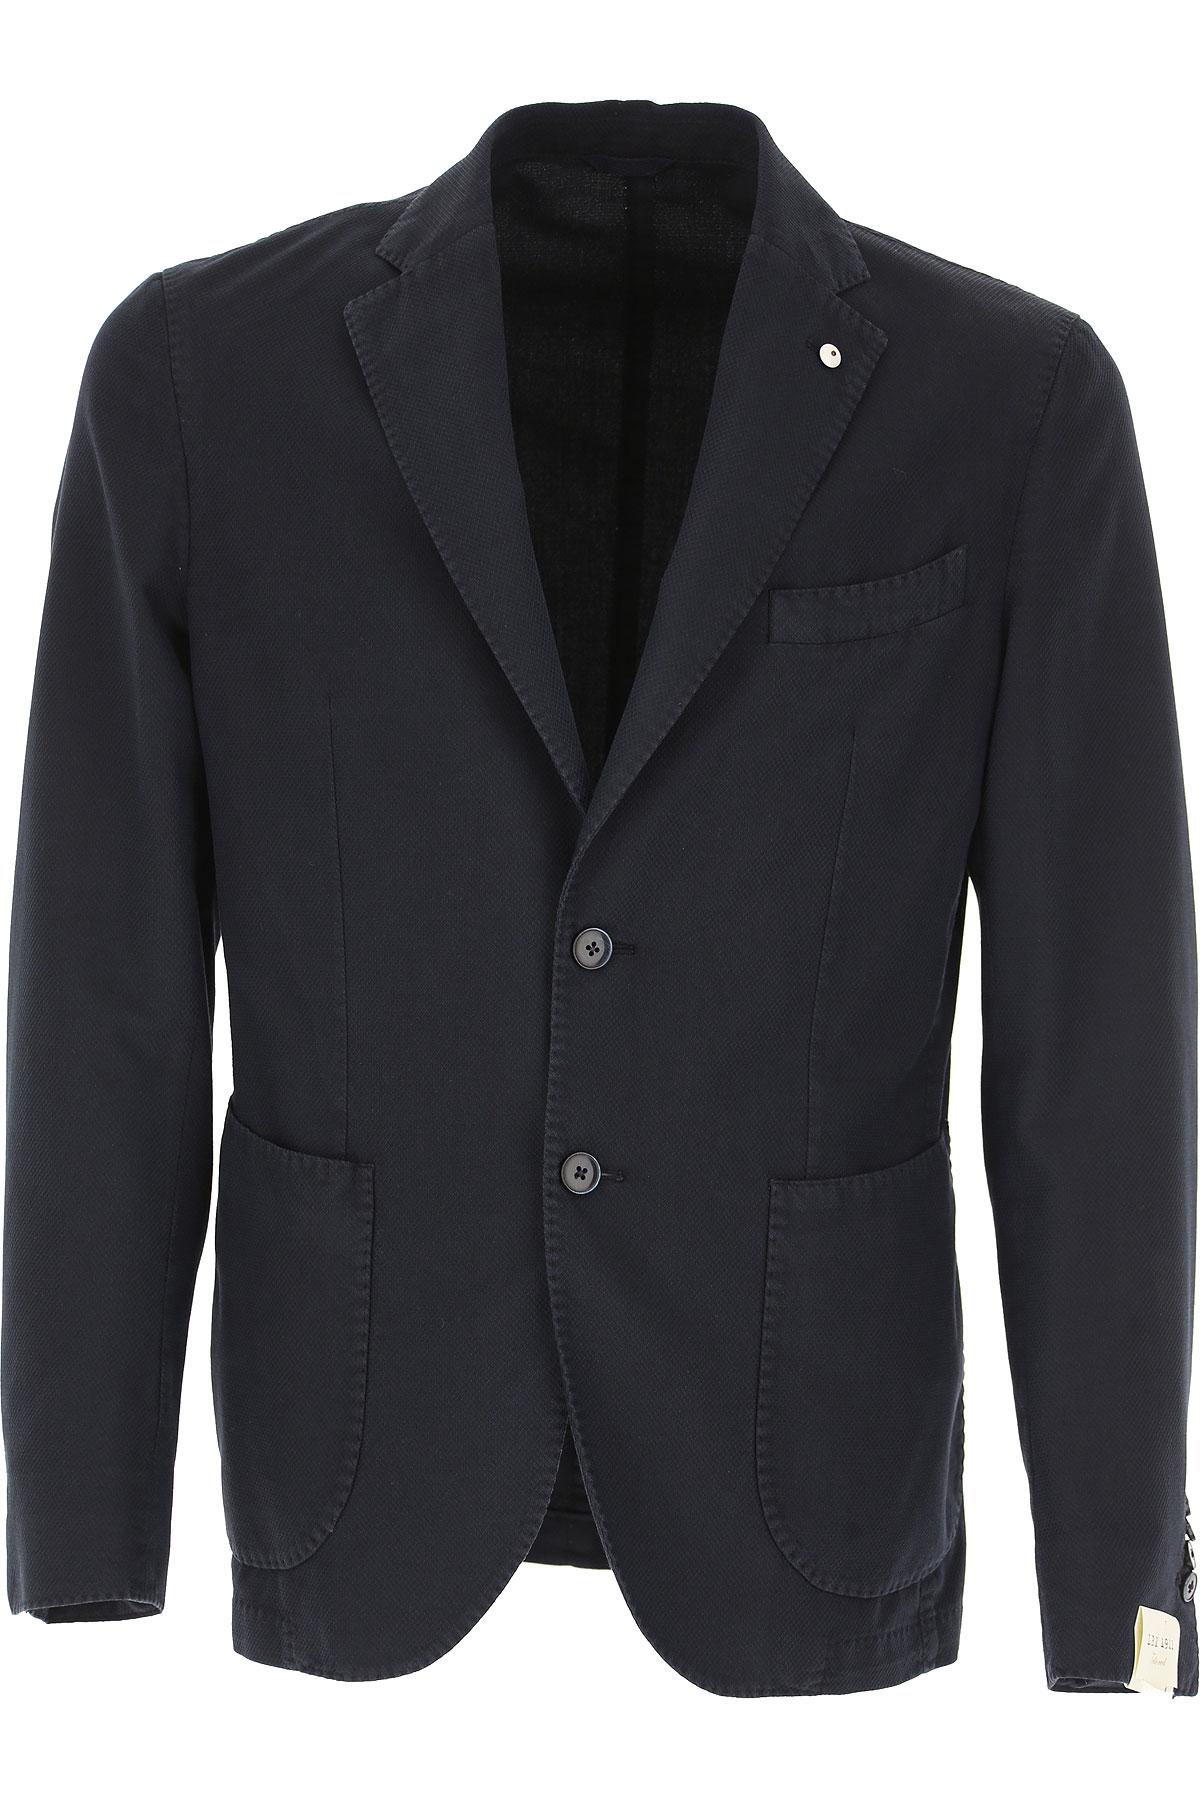 L.B.M. 1911 Blazer Homme, Veste Sport, Bleu marine, Coton, 2017, L M XL XXL